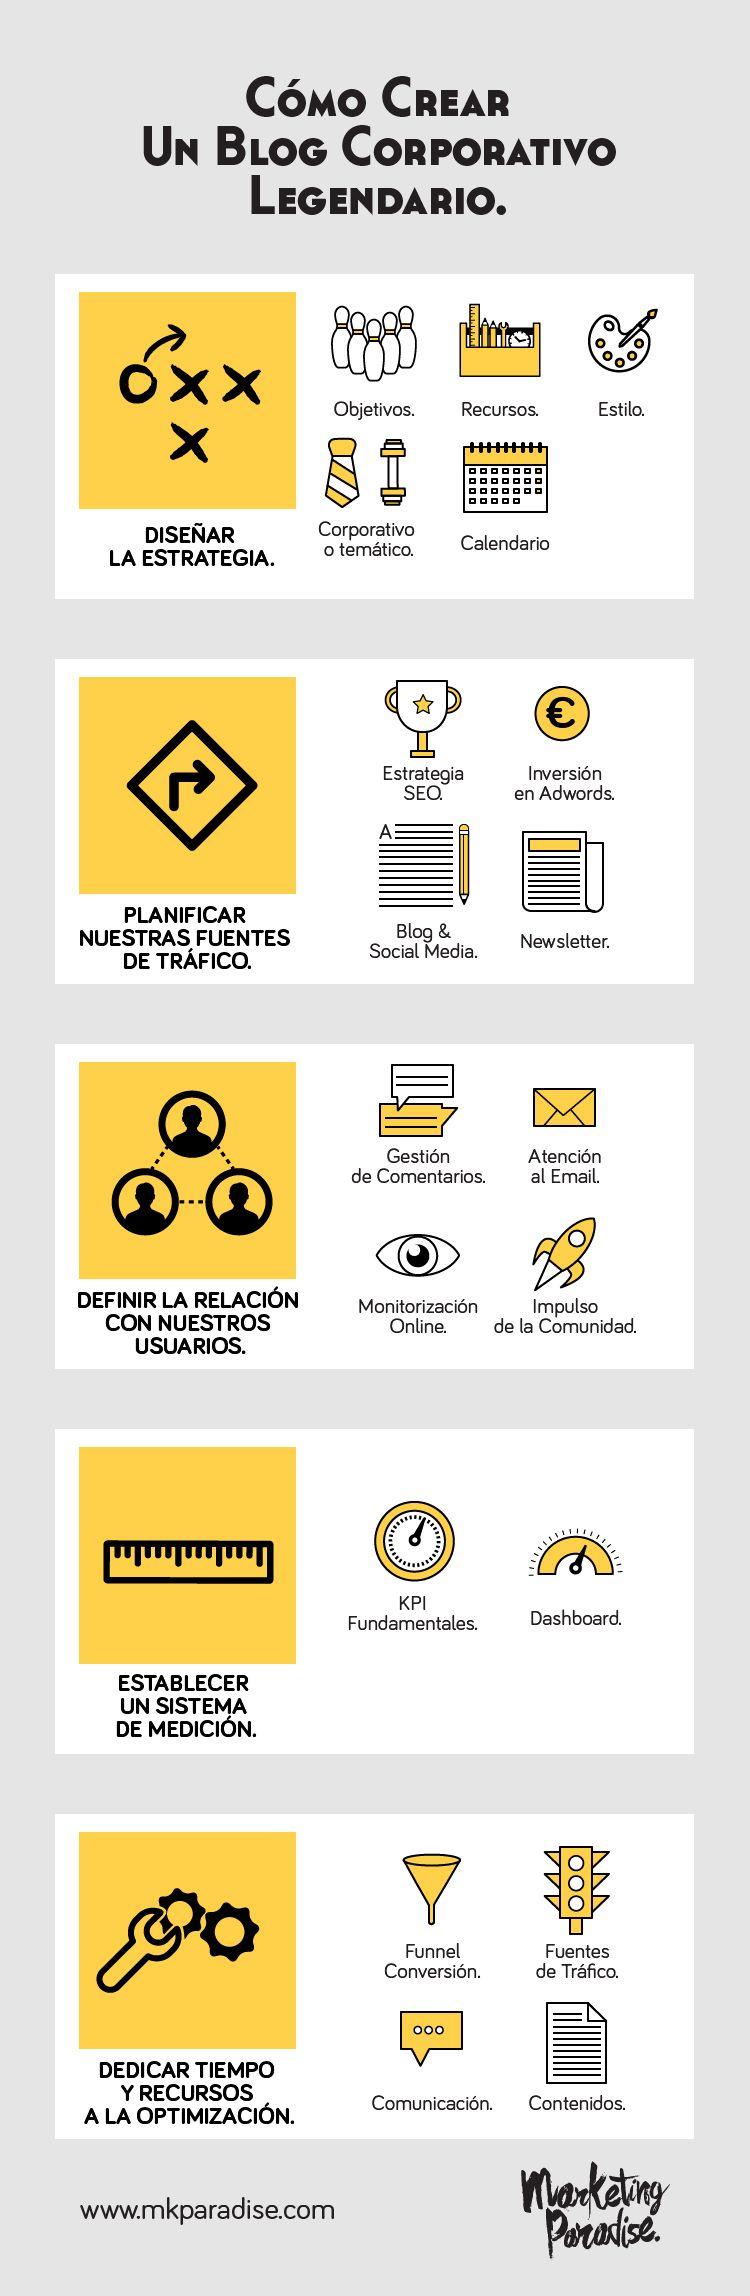 infografia-crear-blog-corporativo